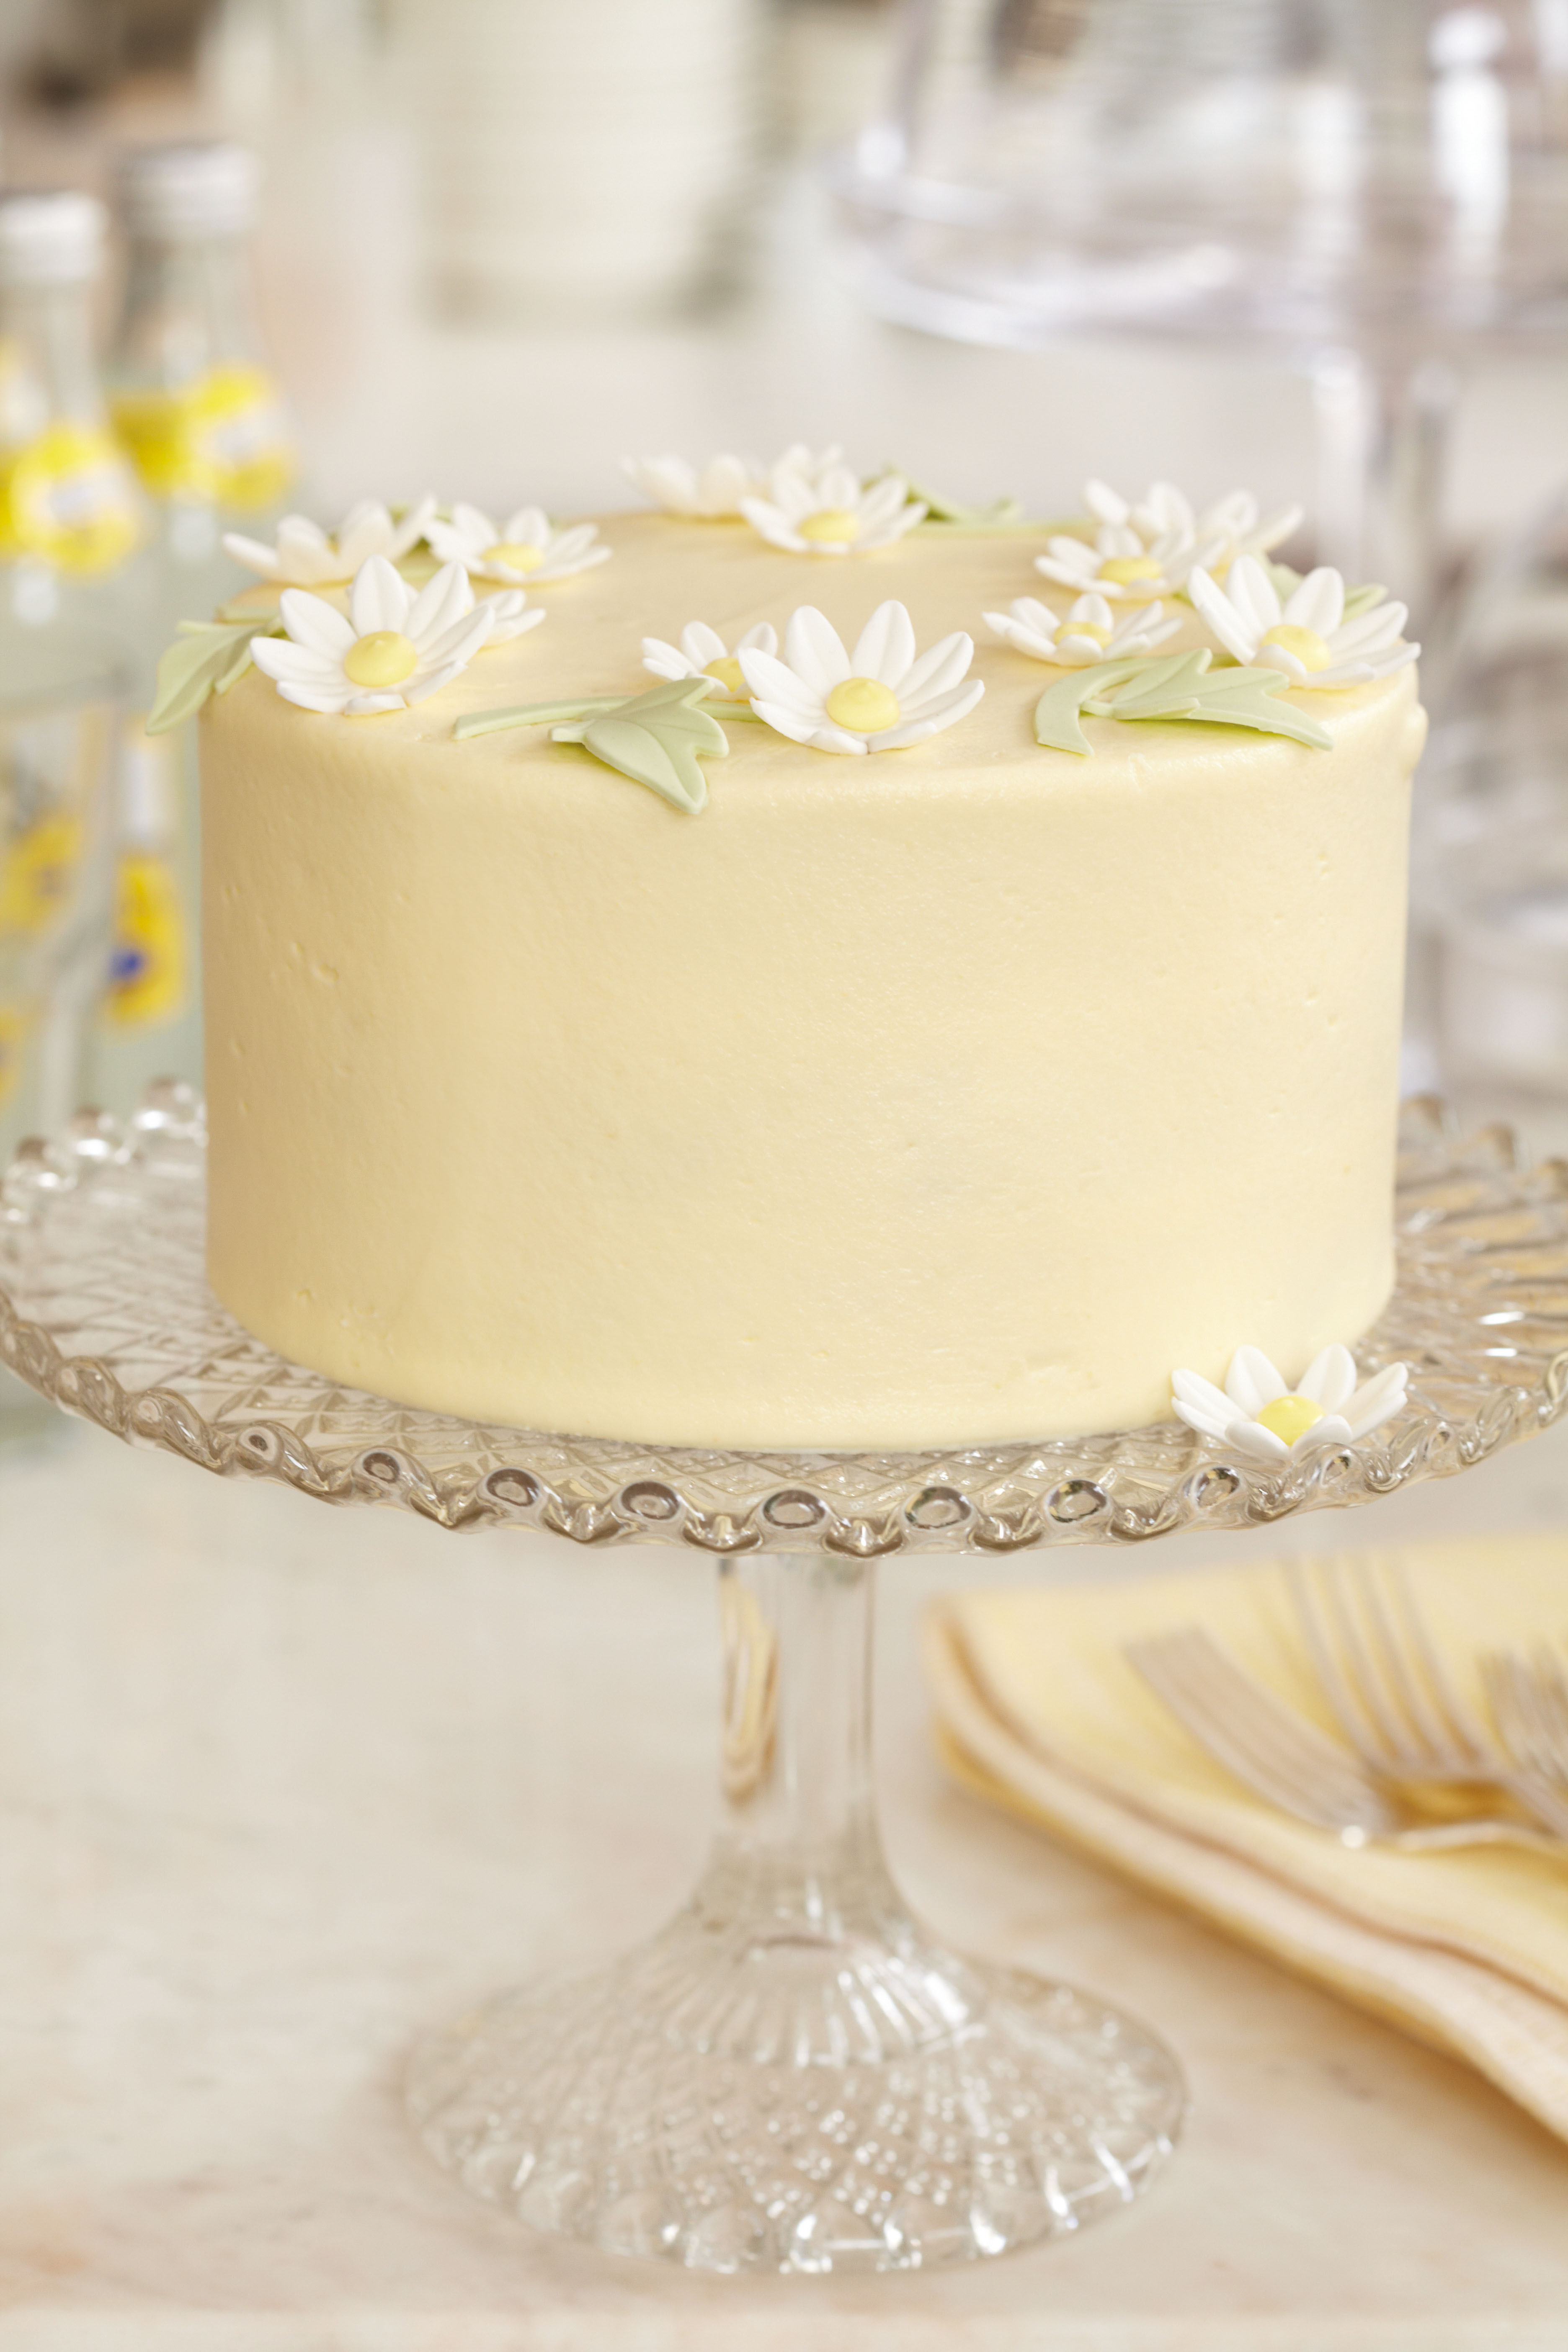 Lemon Wedding Cakes  Lemon Wedding Cake Recipe